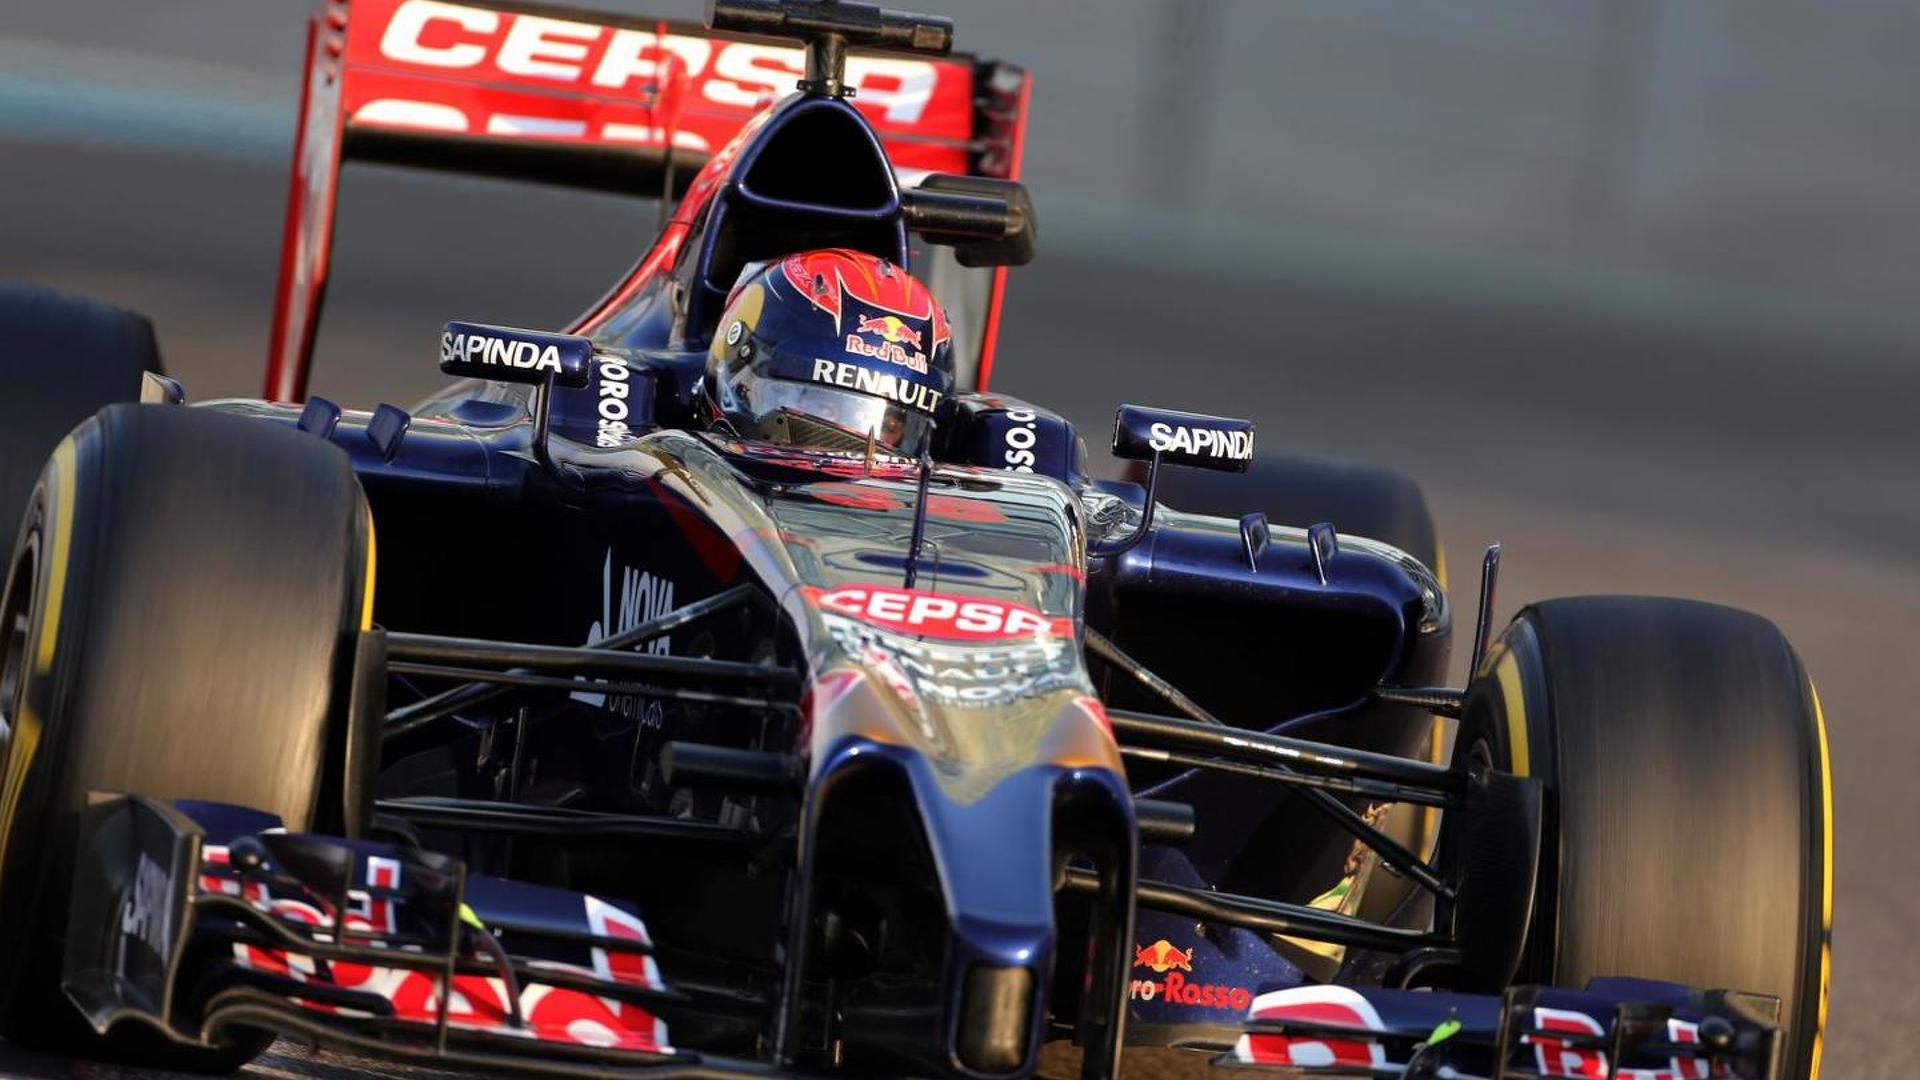 FIA super licence 'points system' emerges